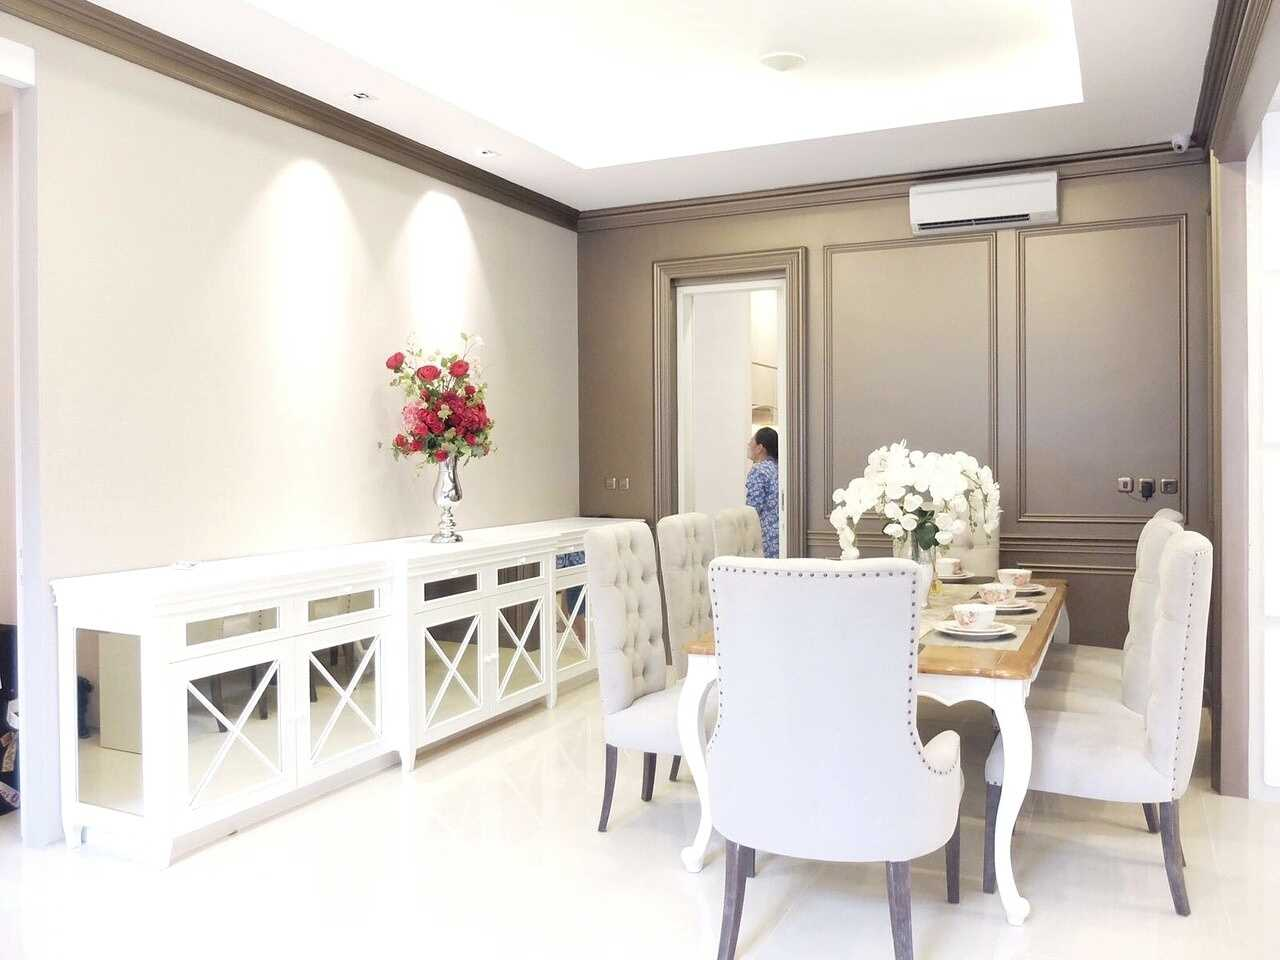 7Design Architect Mrs. D House Citrasun, Yogjakarta Citrasun, Yogjakarta Diningroom Klasik 18698